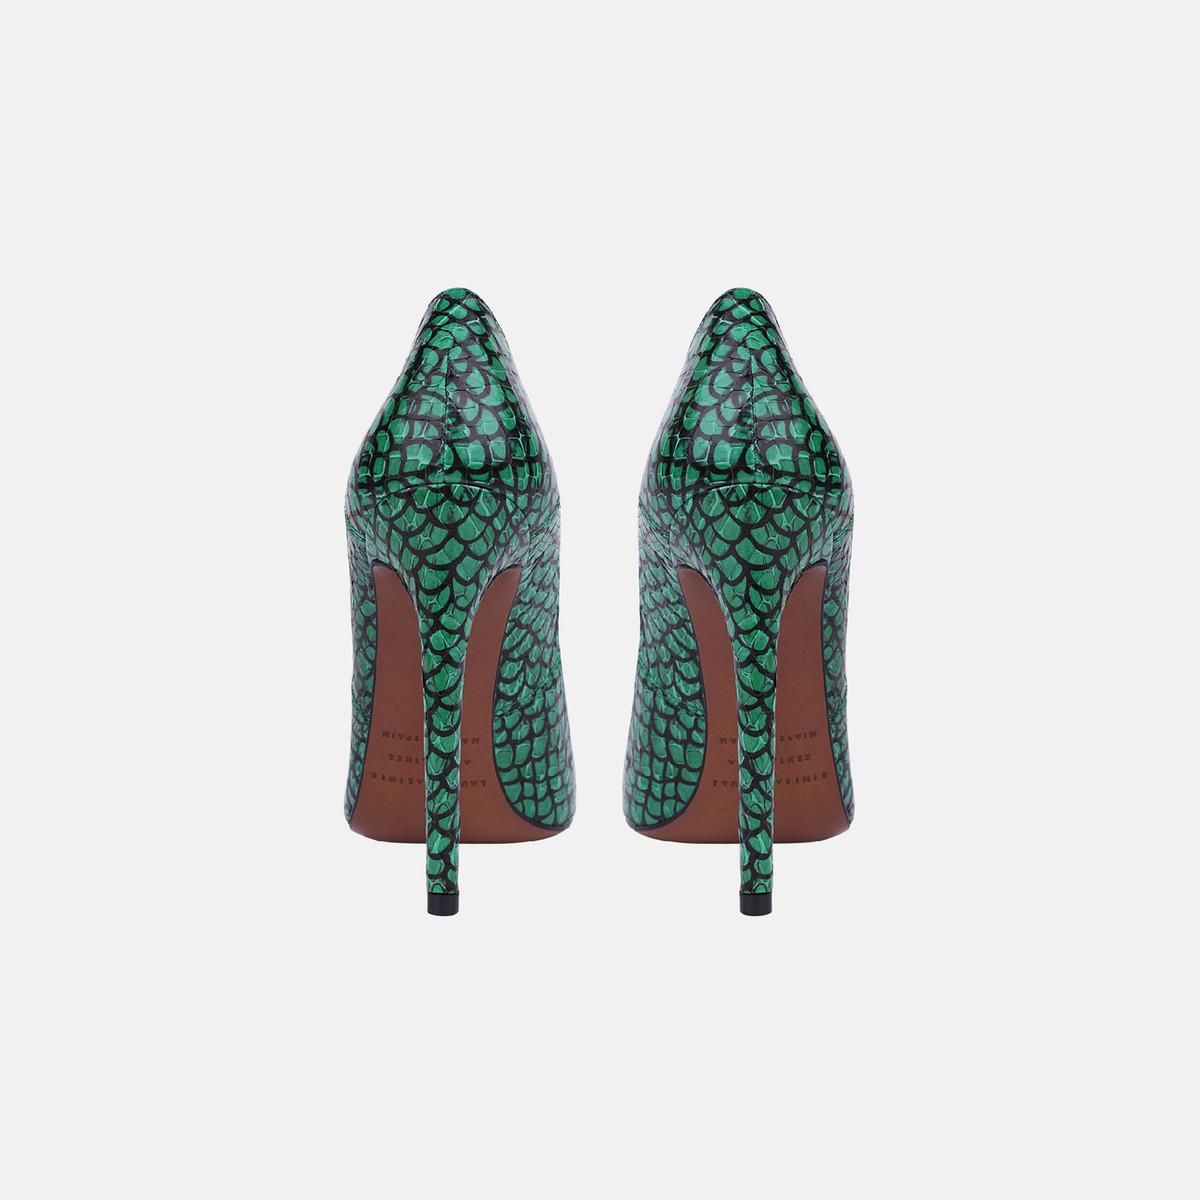 GILDA PUMP Printed Emerald Snakeskin